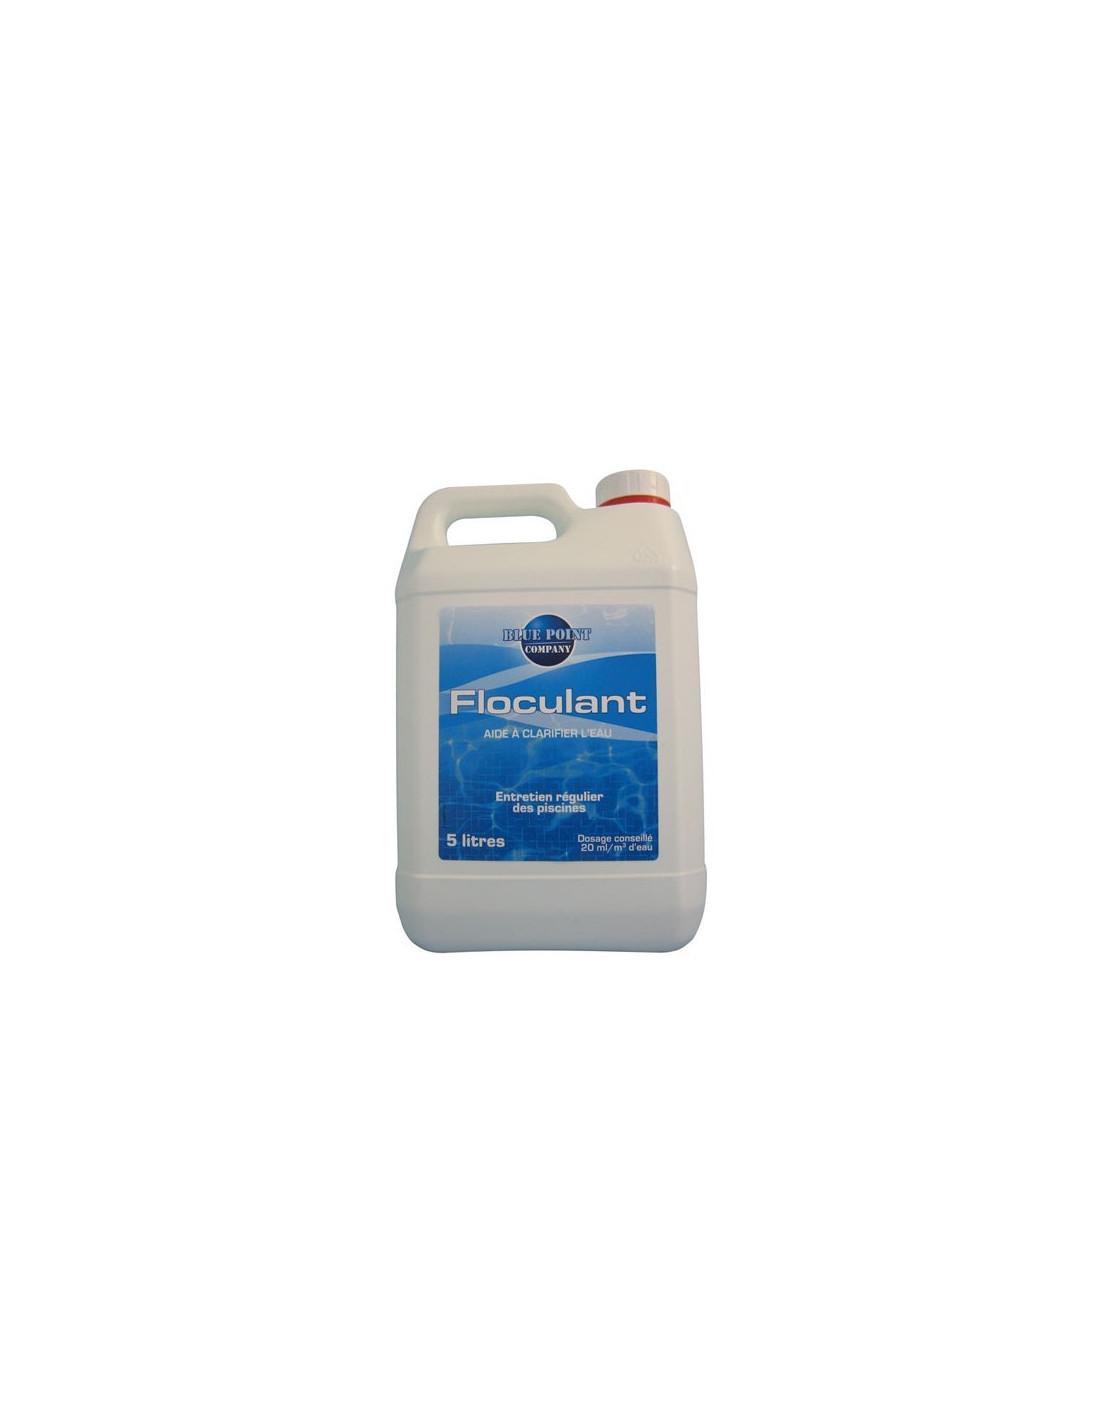 Hydrapro floculant liquide 5l hyper brico for Clarifiant liquide piscine